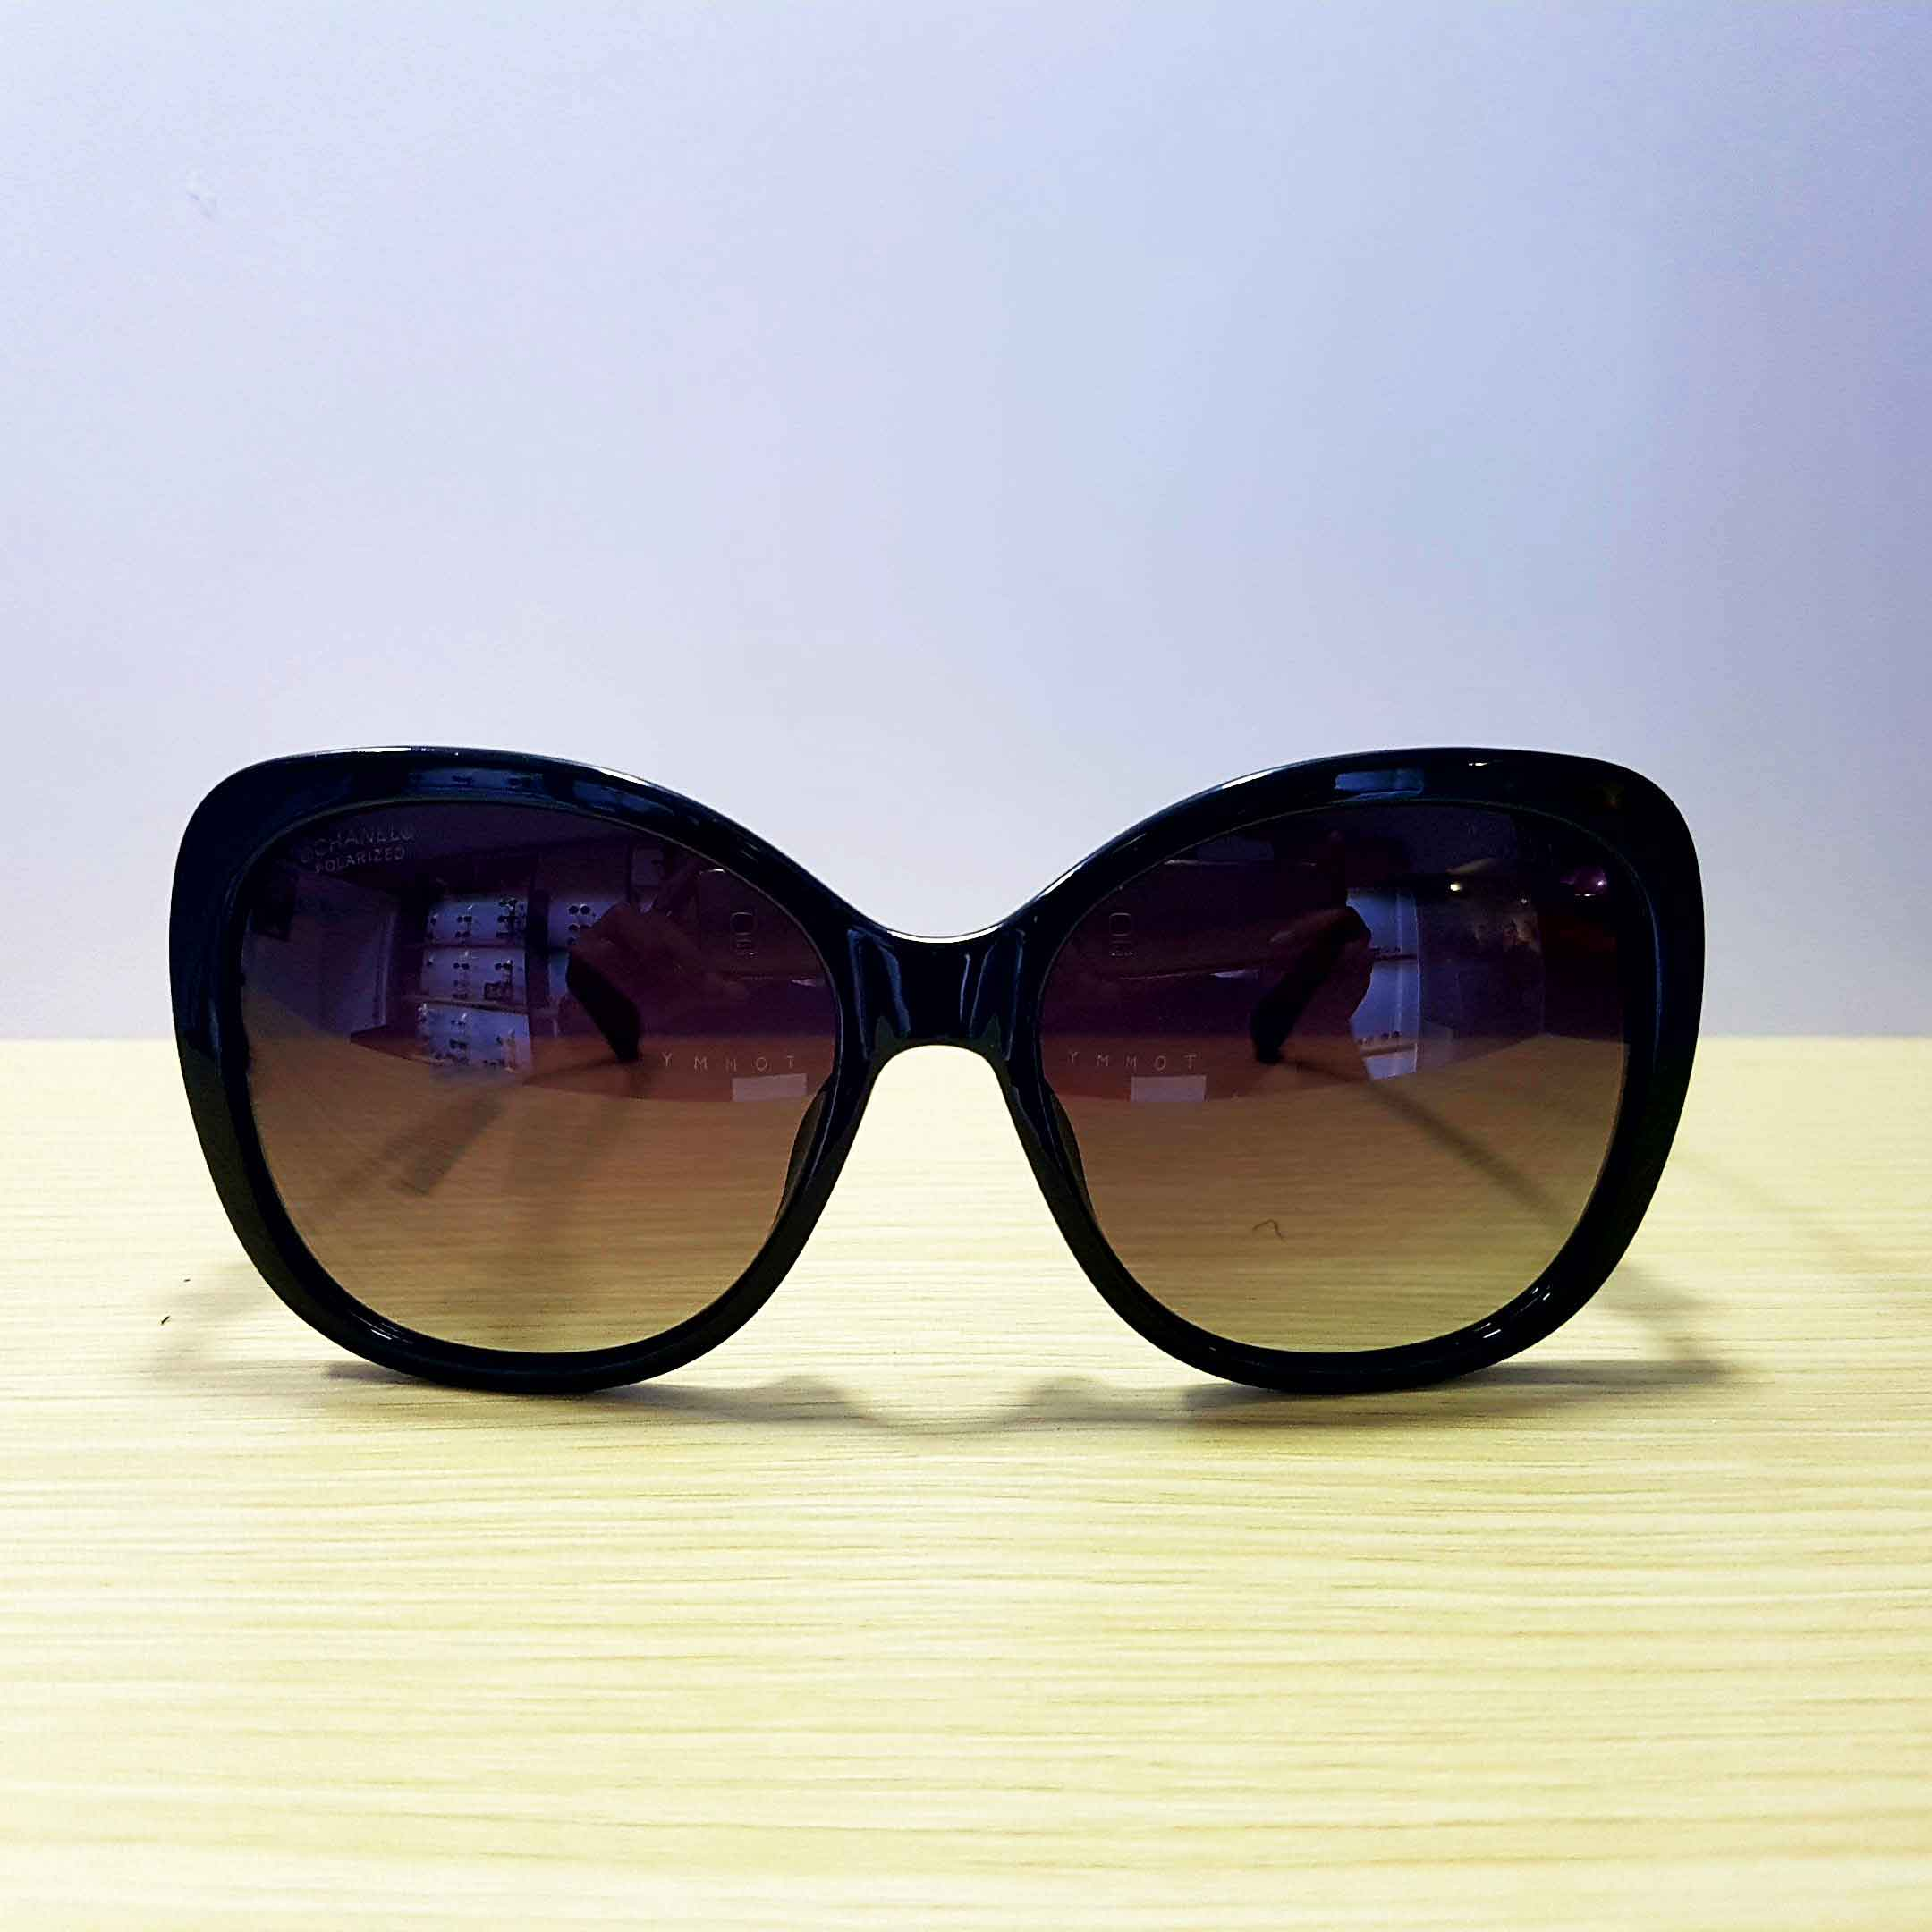 Chanel 5339 Black